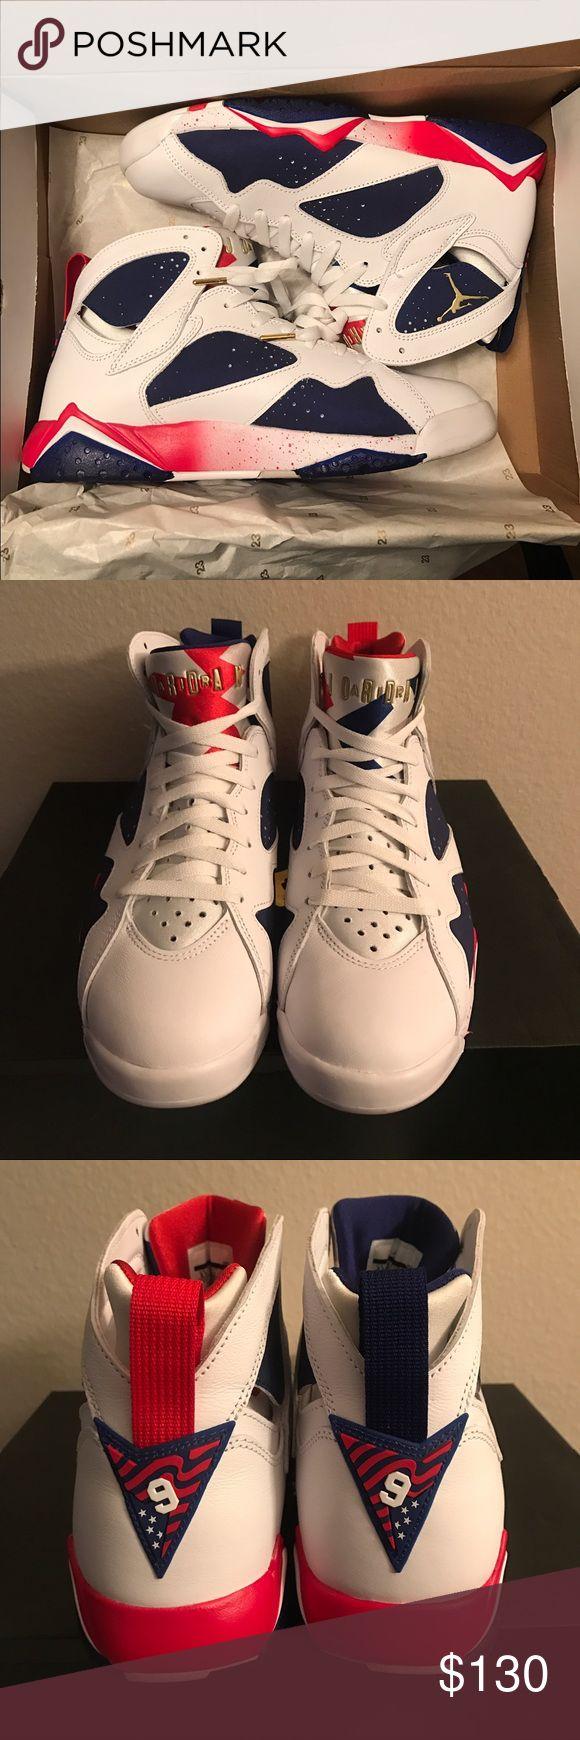 Air Jordan 7 Retro 2016 Olympic Alternate Air Jordan 7 Retro. Brand new NEVER WORN! Comes with the box. Nike Shoes Sneakers